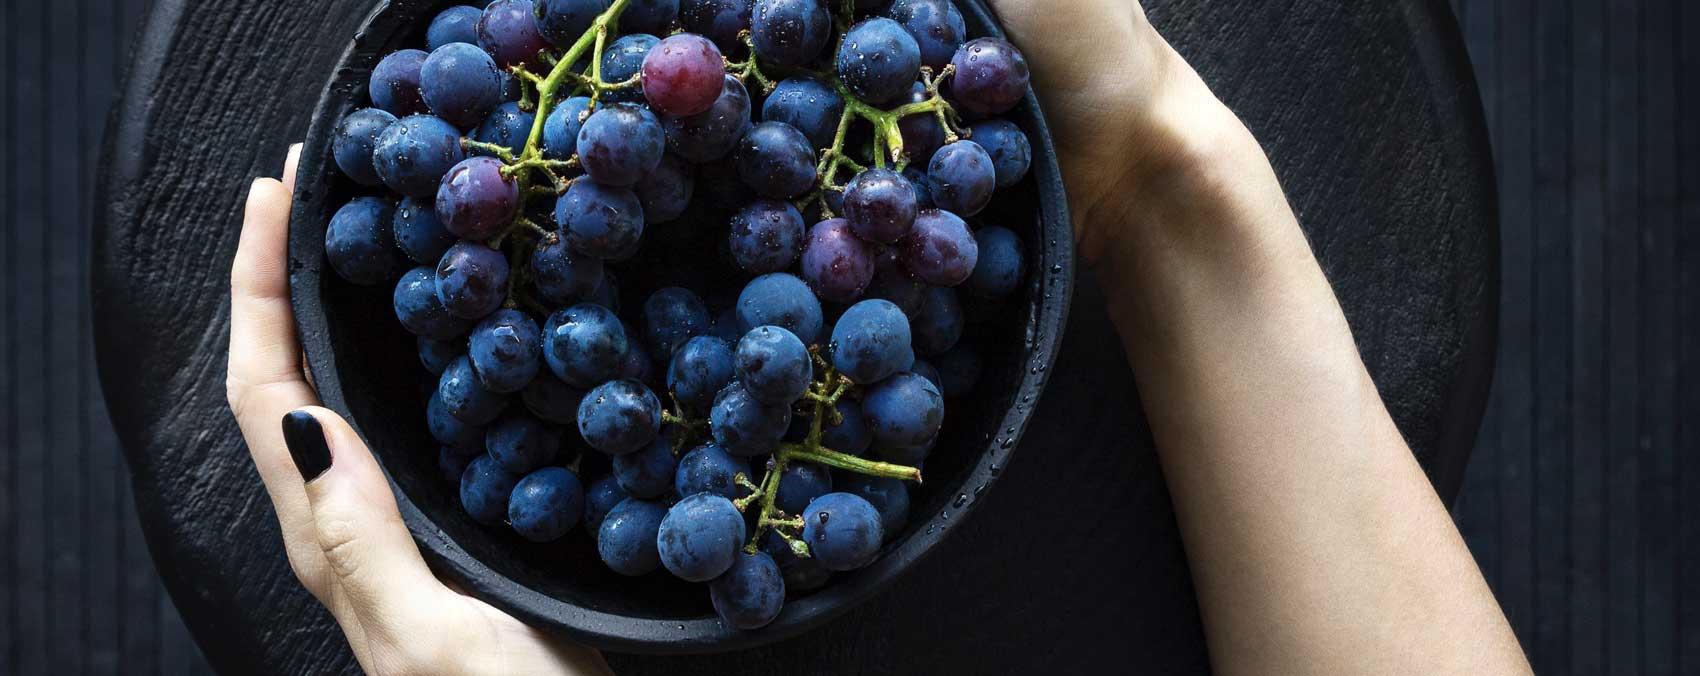 Dieta per sindrome metabolica